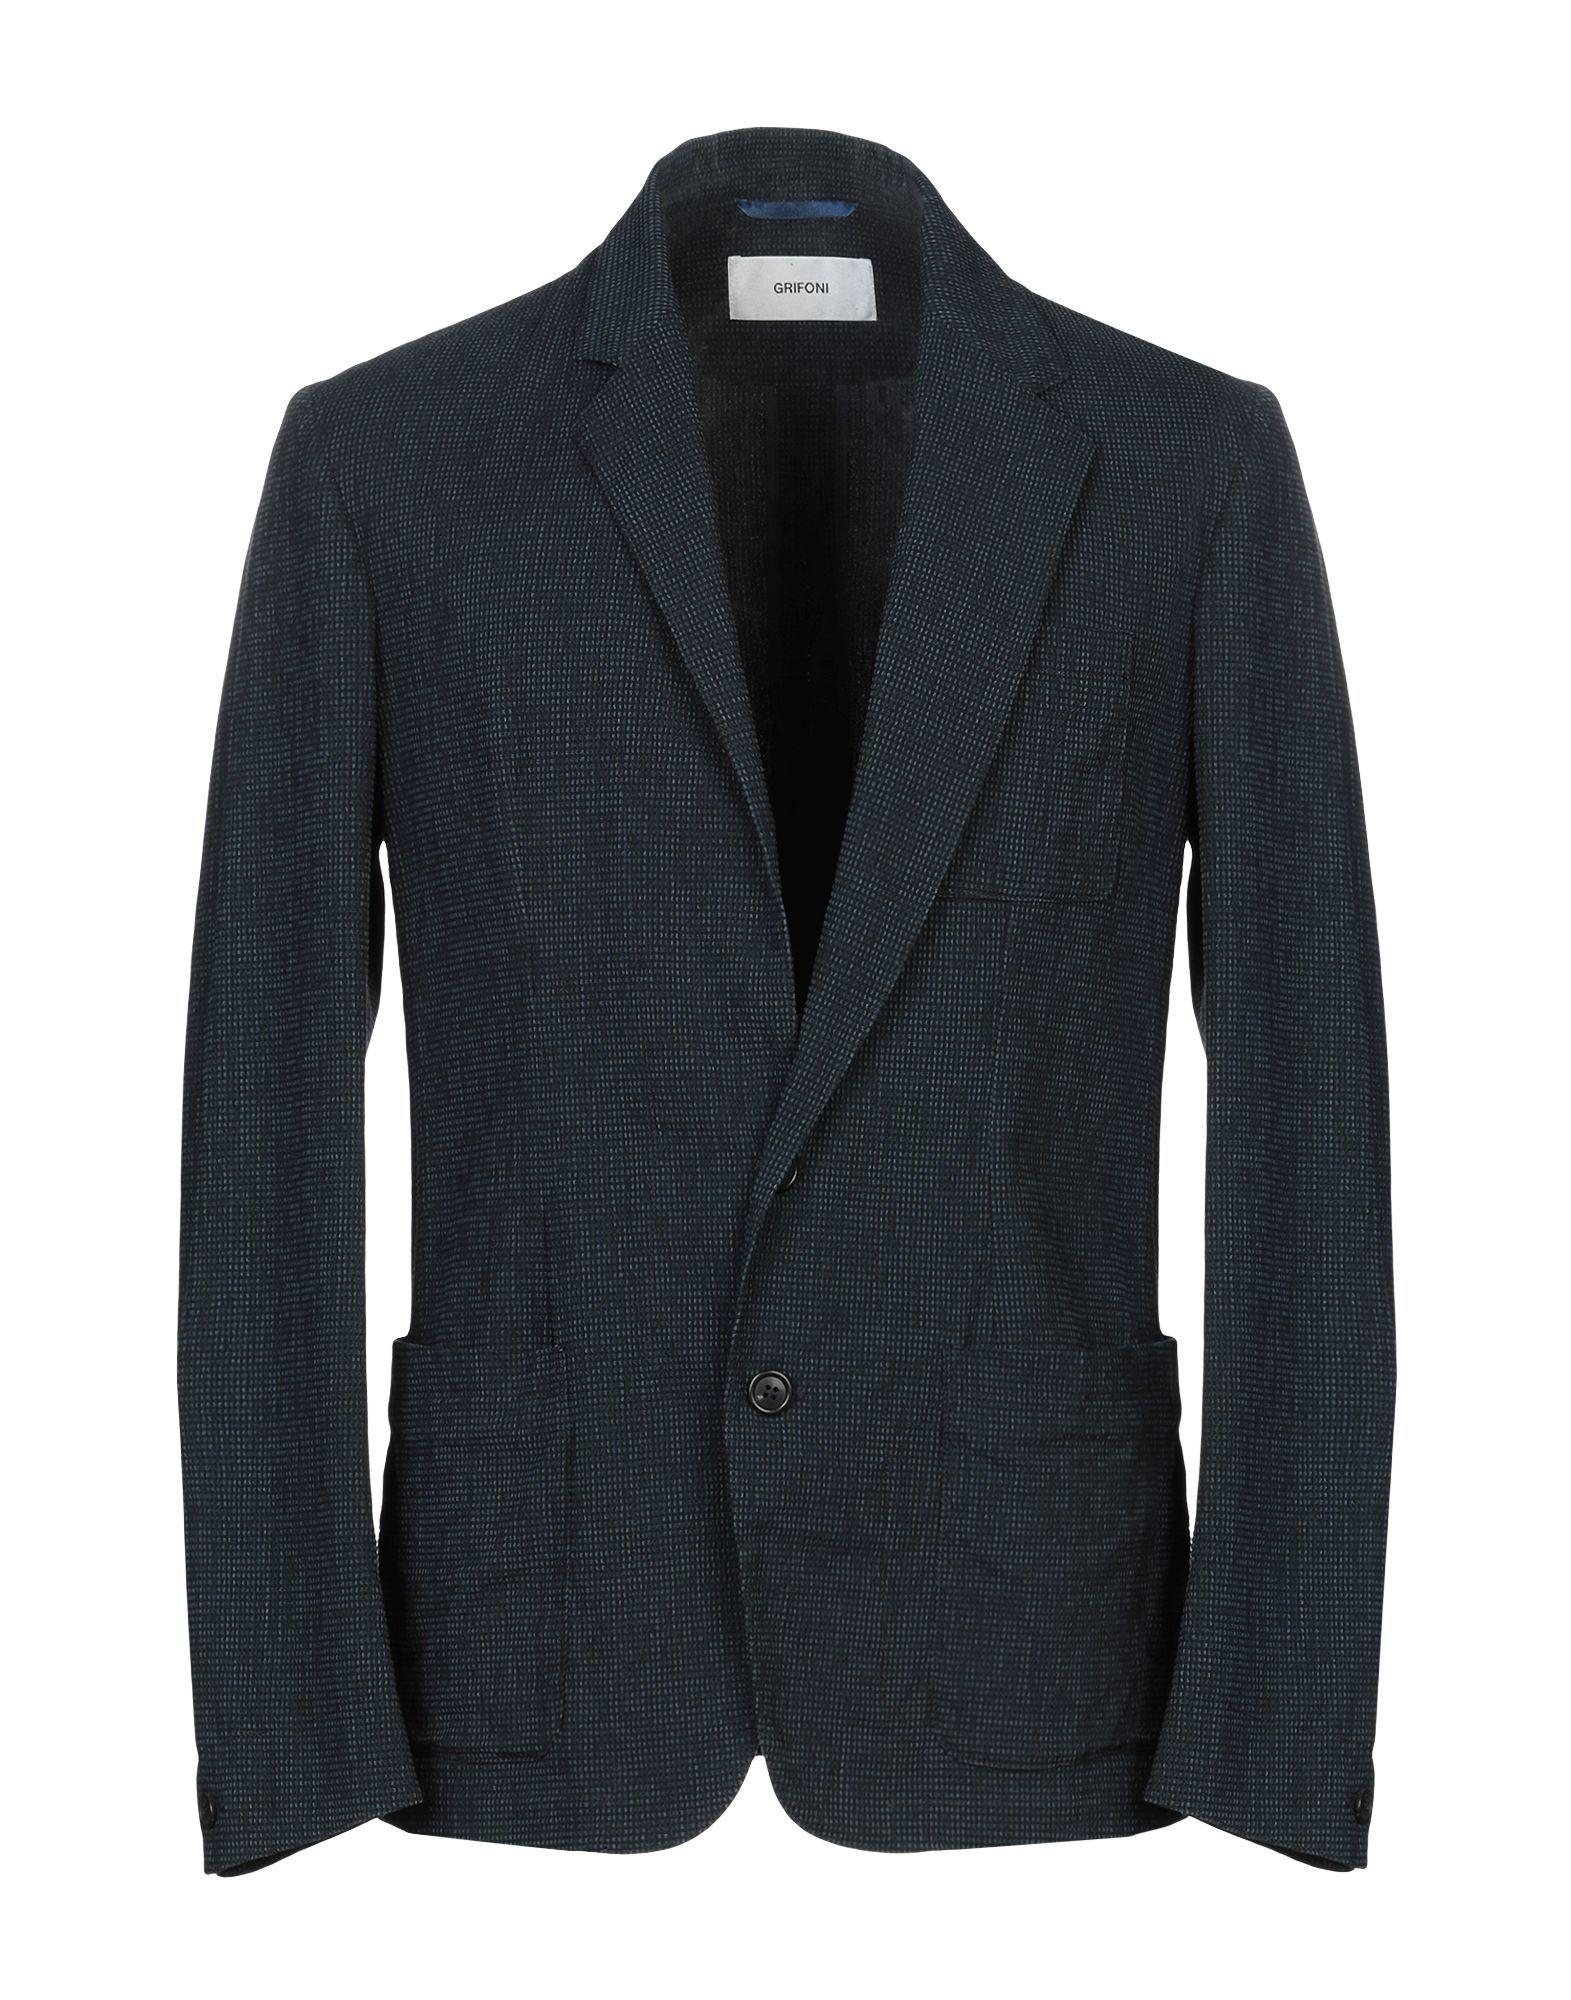 Mauro Grifoni Blue Cotton Single Breasted Jacket